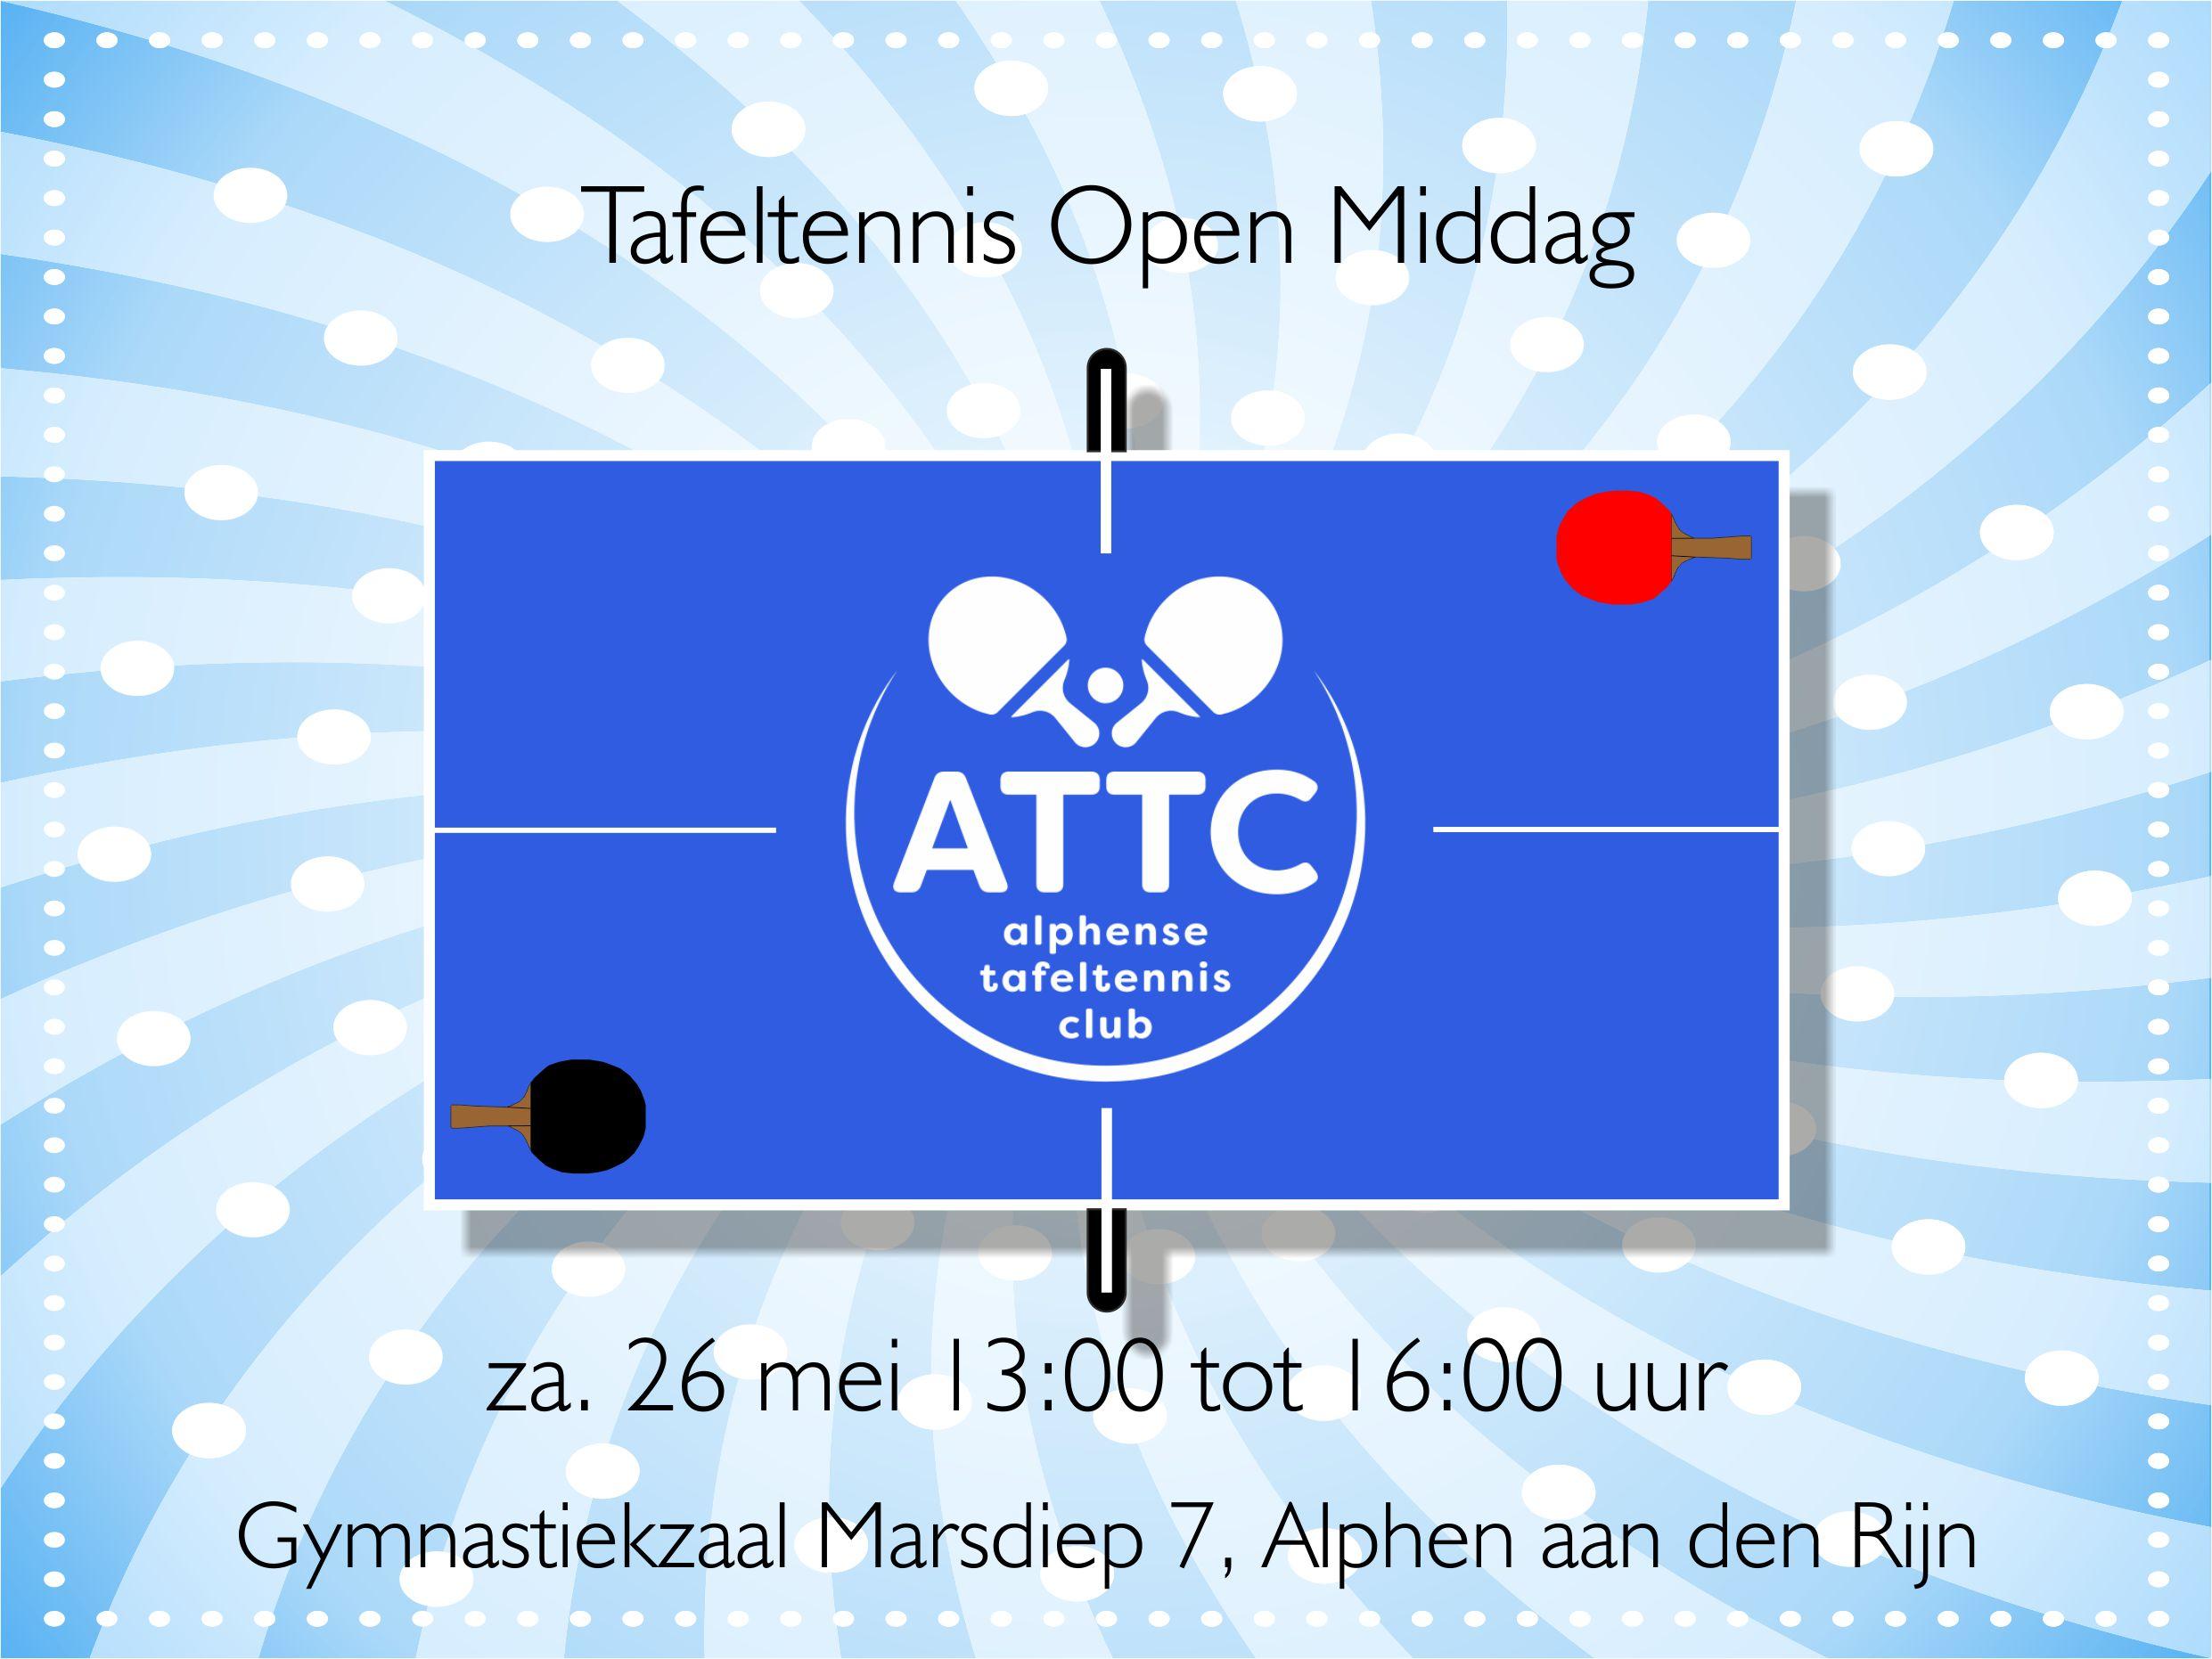 ATTC Open Middag zaterdag 26 mei